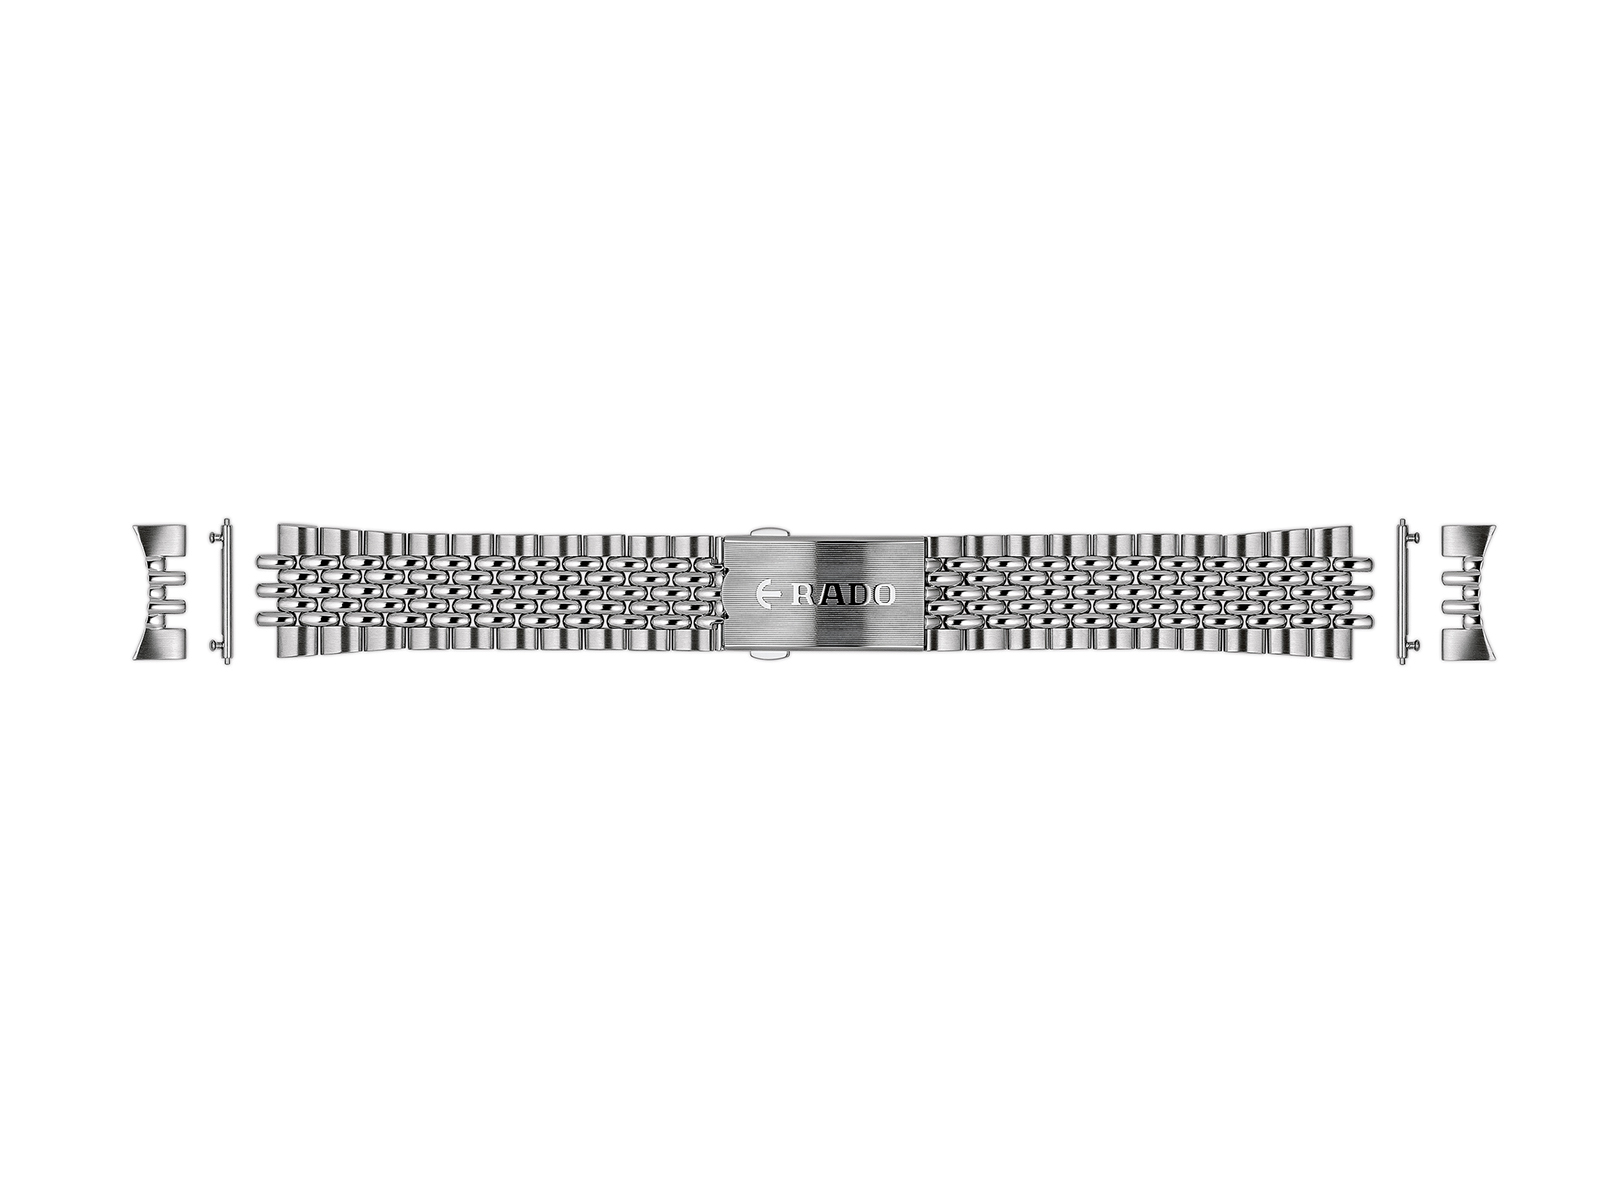 【RADO ラドー】数量限定品/Captain Cook キャプテンクック(ブラック)トラベルケース付き/正規輸入品